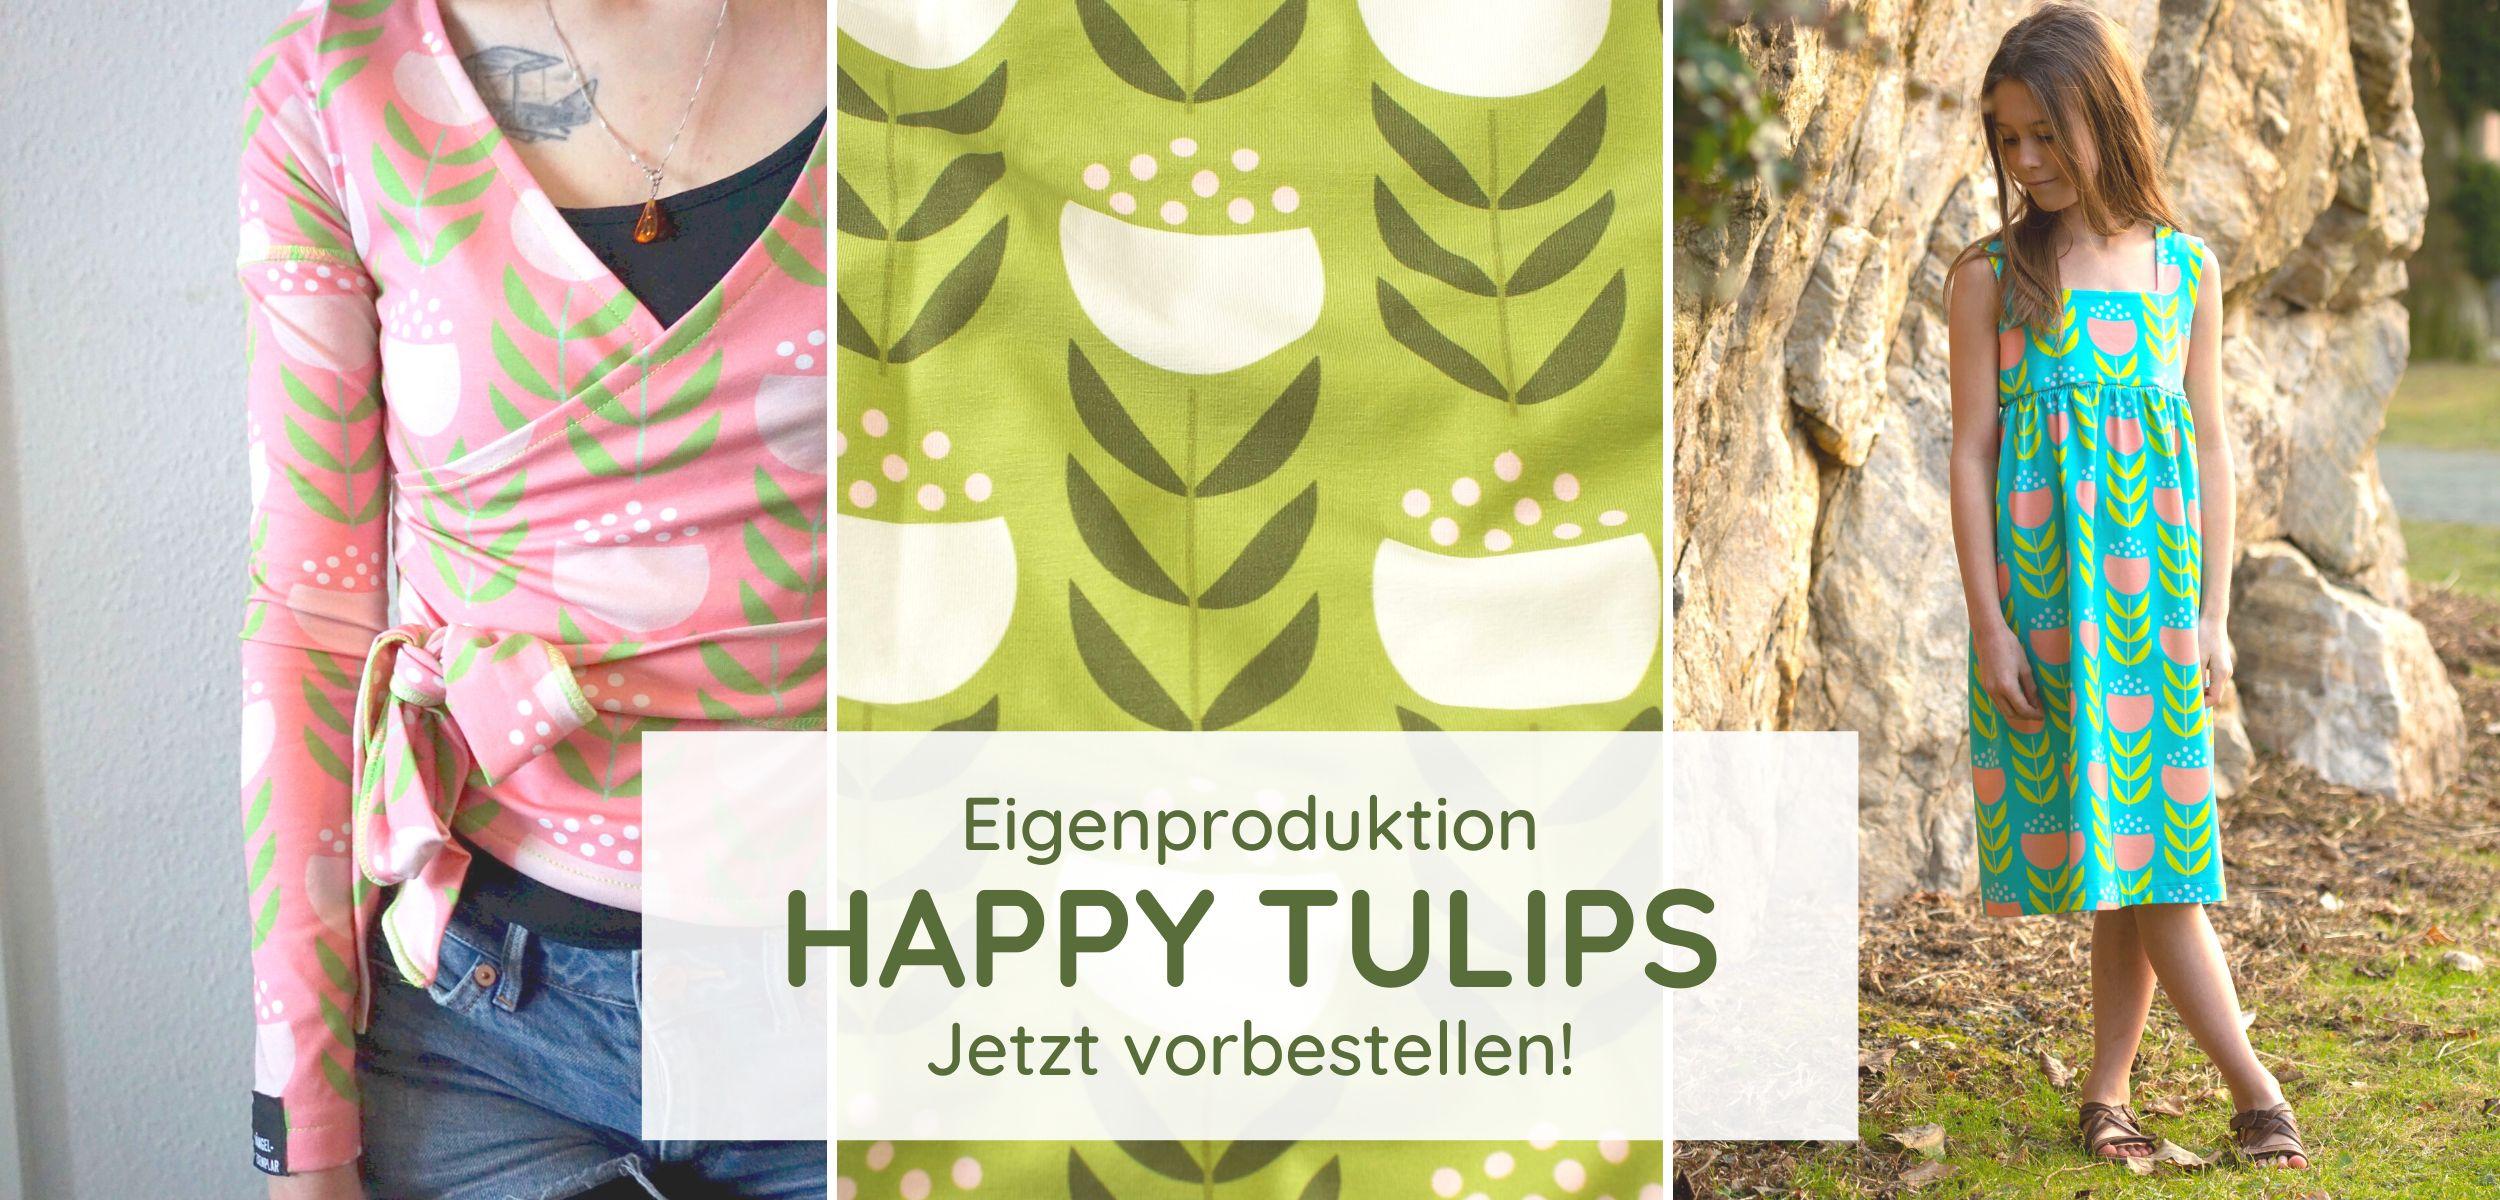 Shopbanner happy tulips